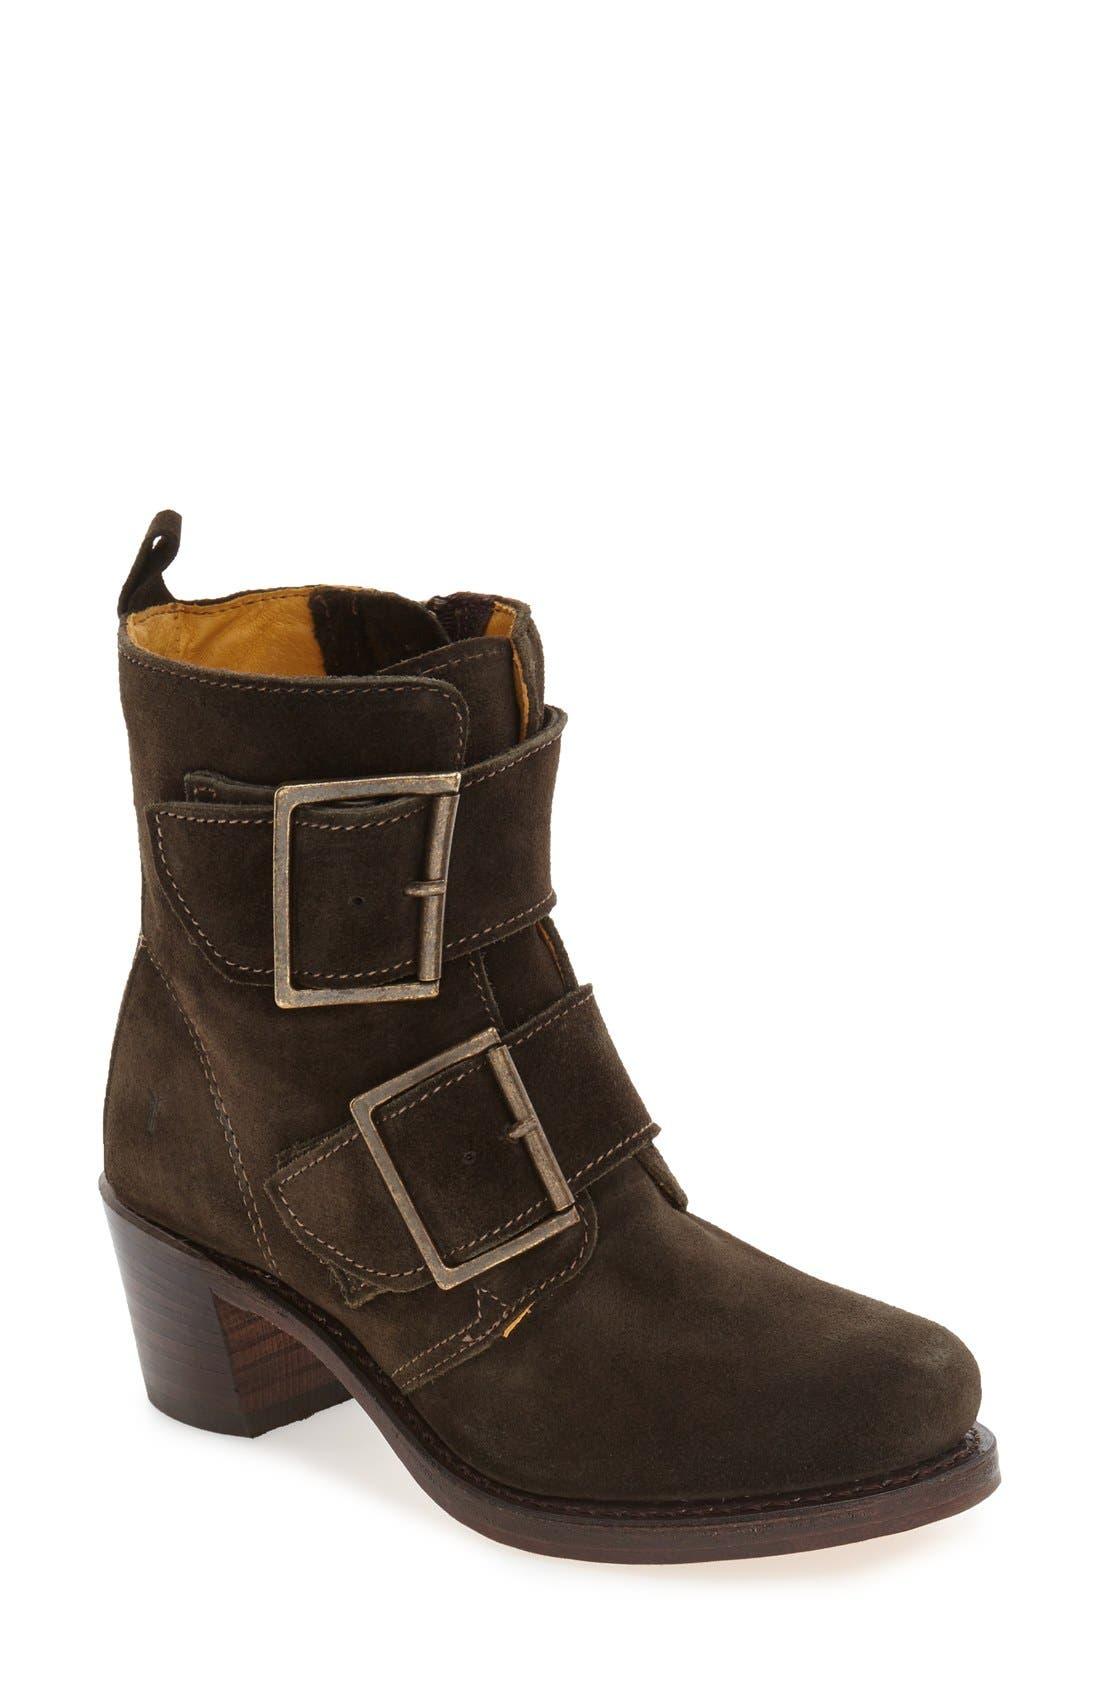 Main Image - Frye 'Sabrina' Double Buckle Boot (Women)